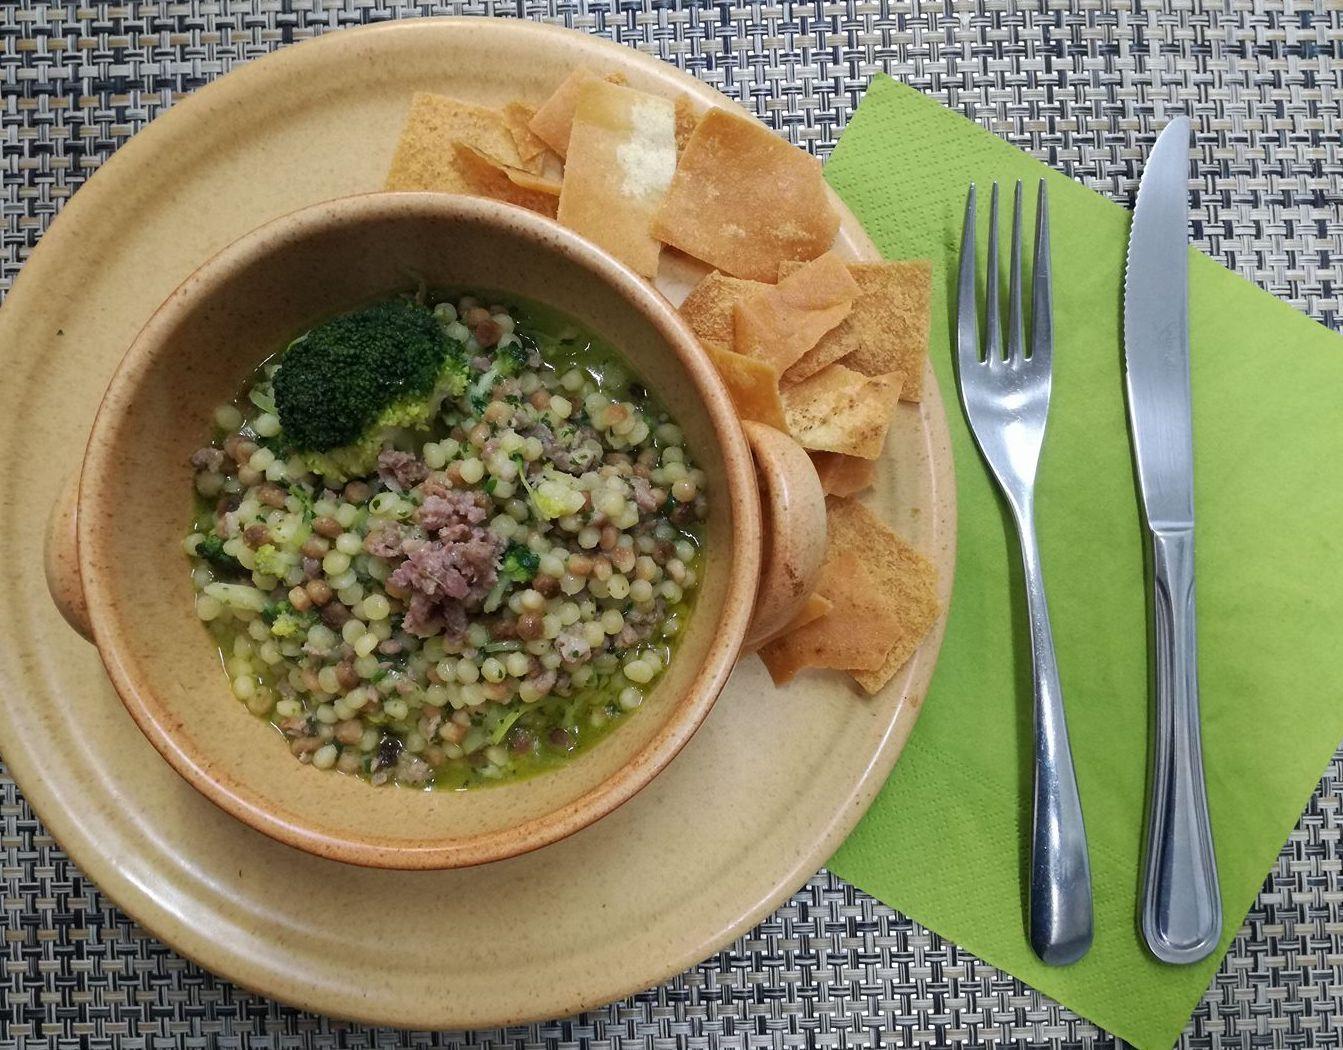 fregola broccoli e salsiccia fresca